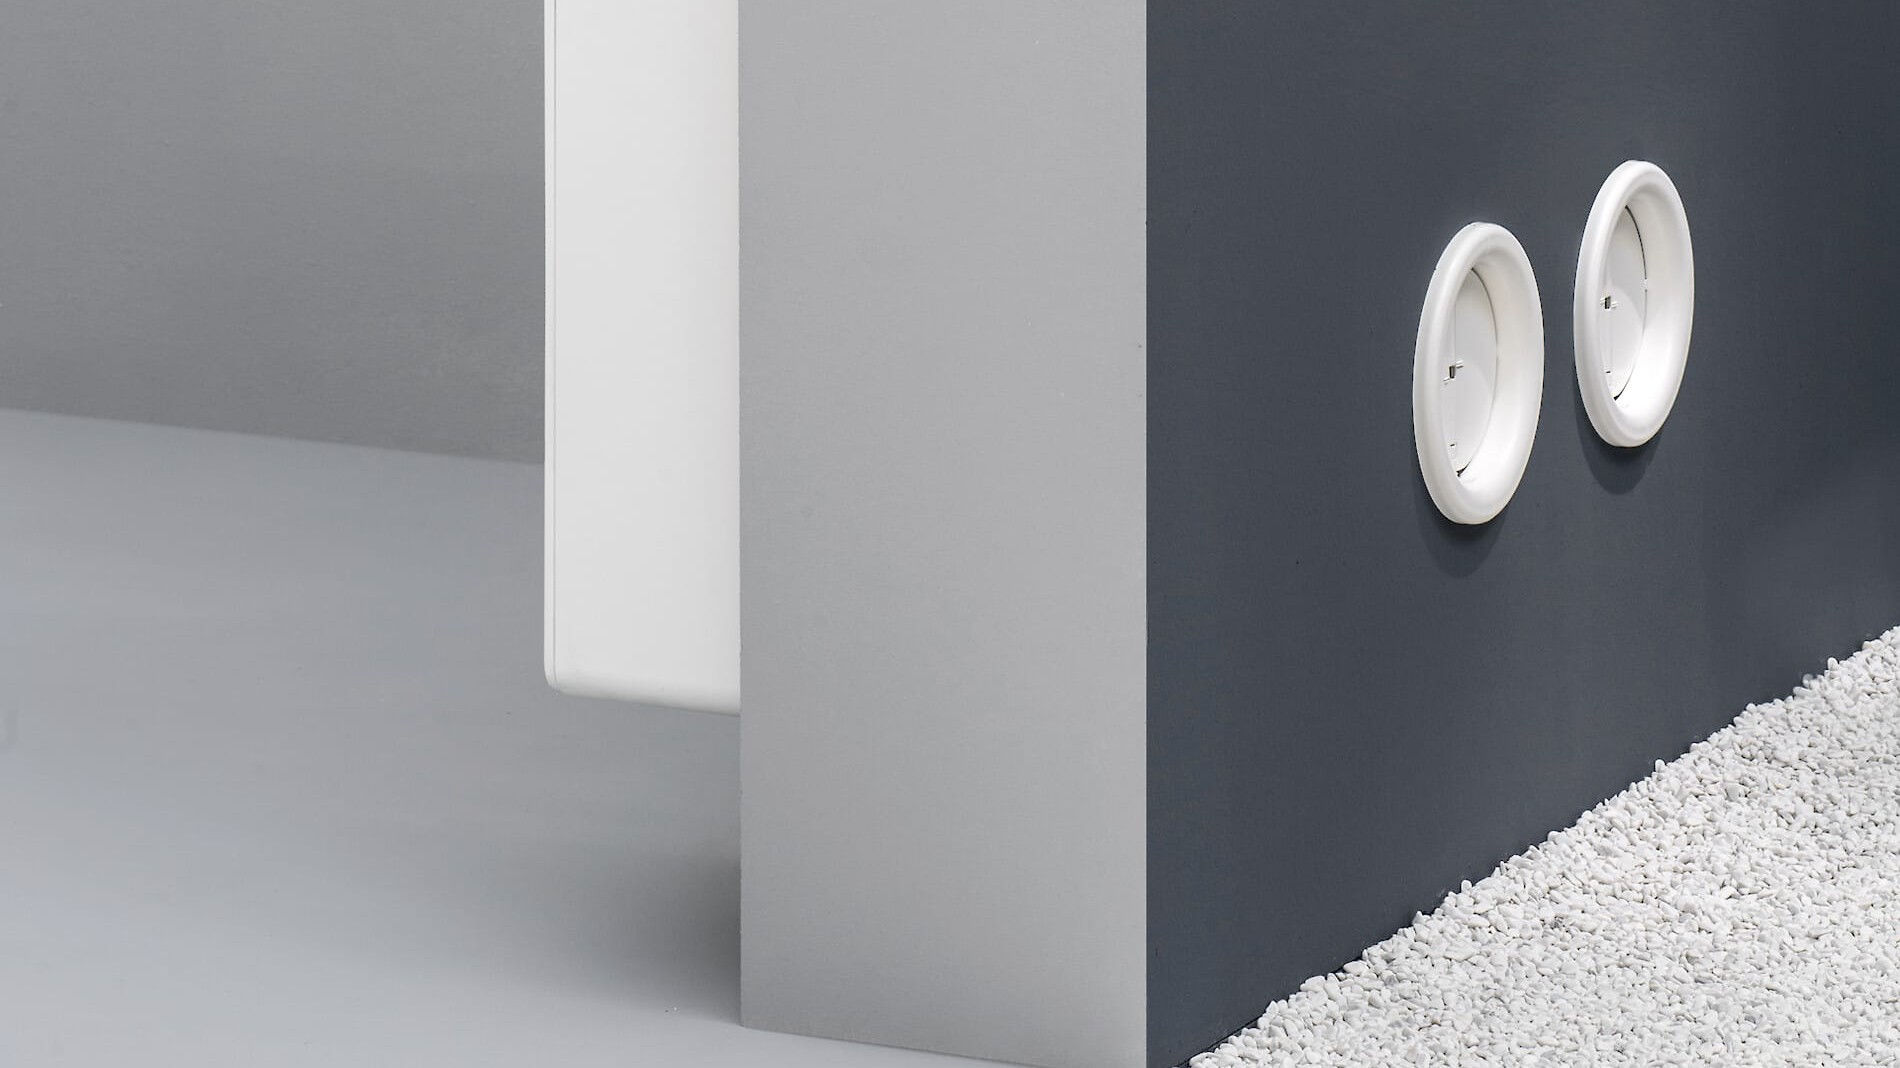 Green House Solutions zonnepanelen batterijopslag laadpalen airconditioning facile da installare.1900x0